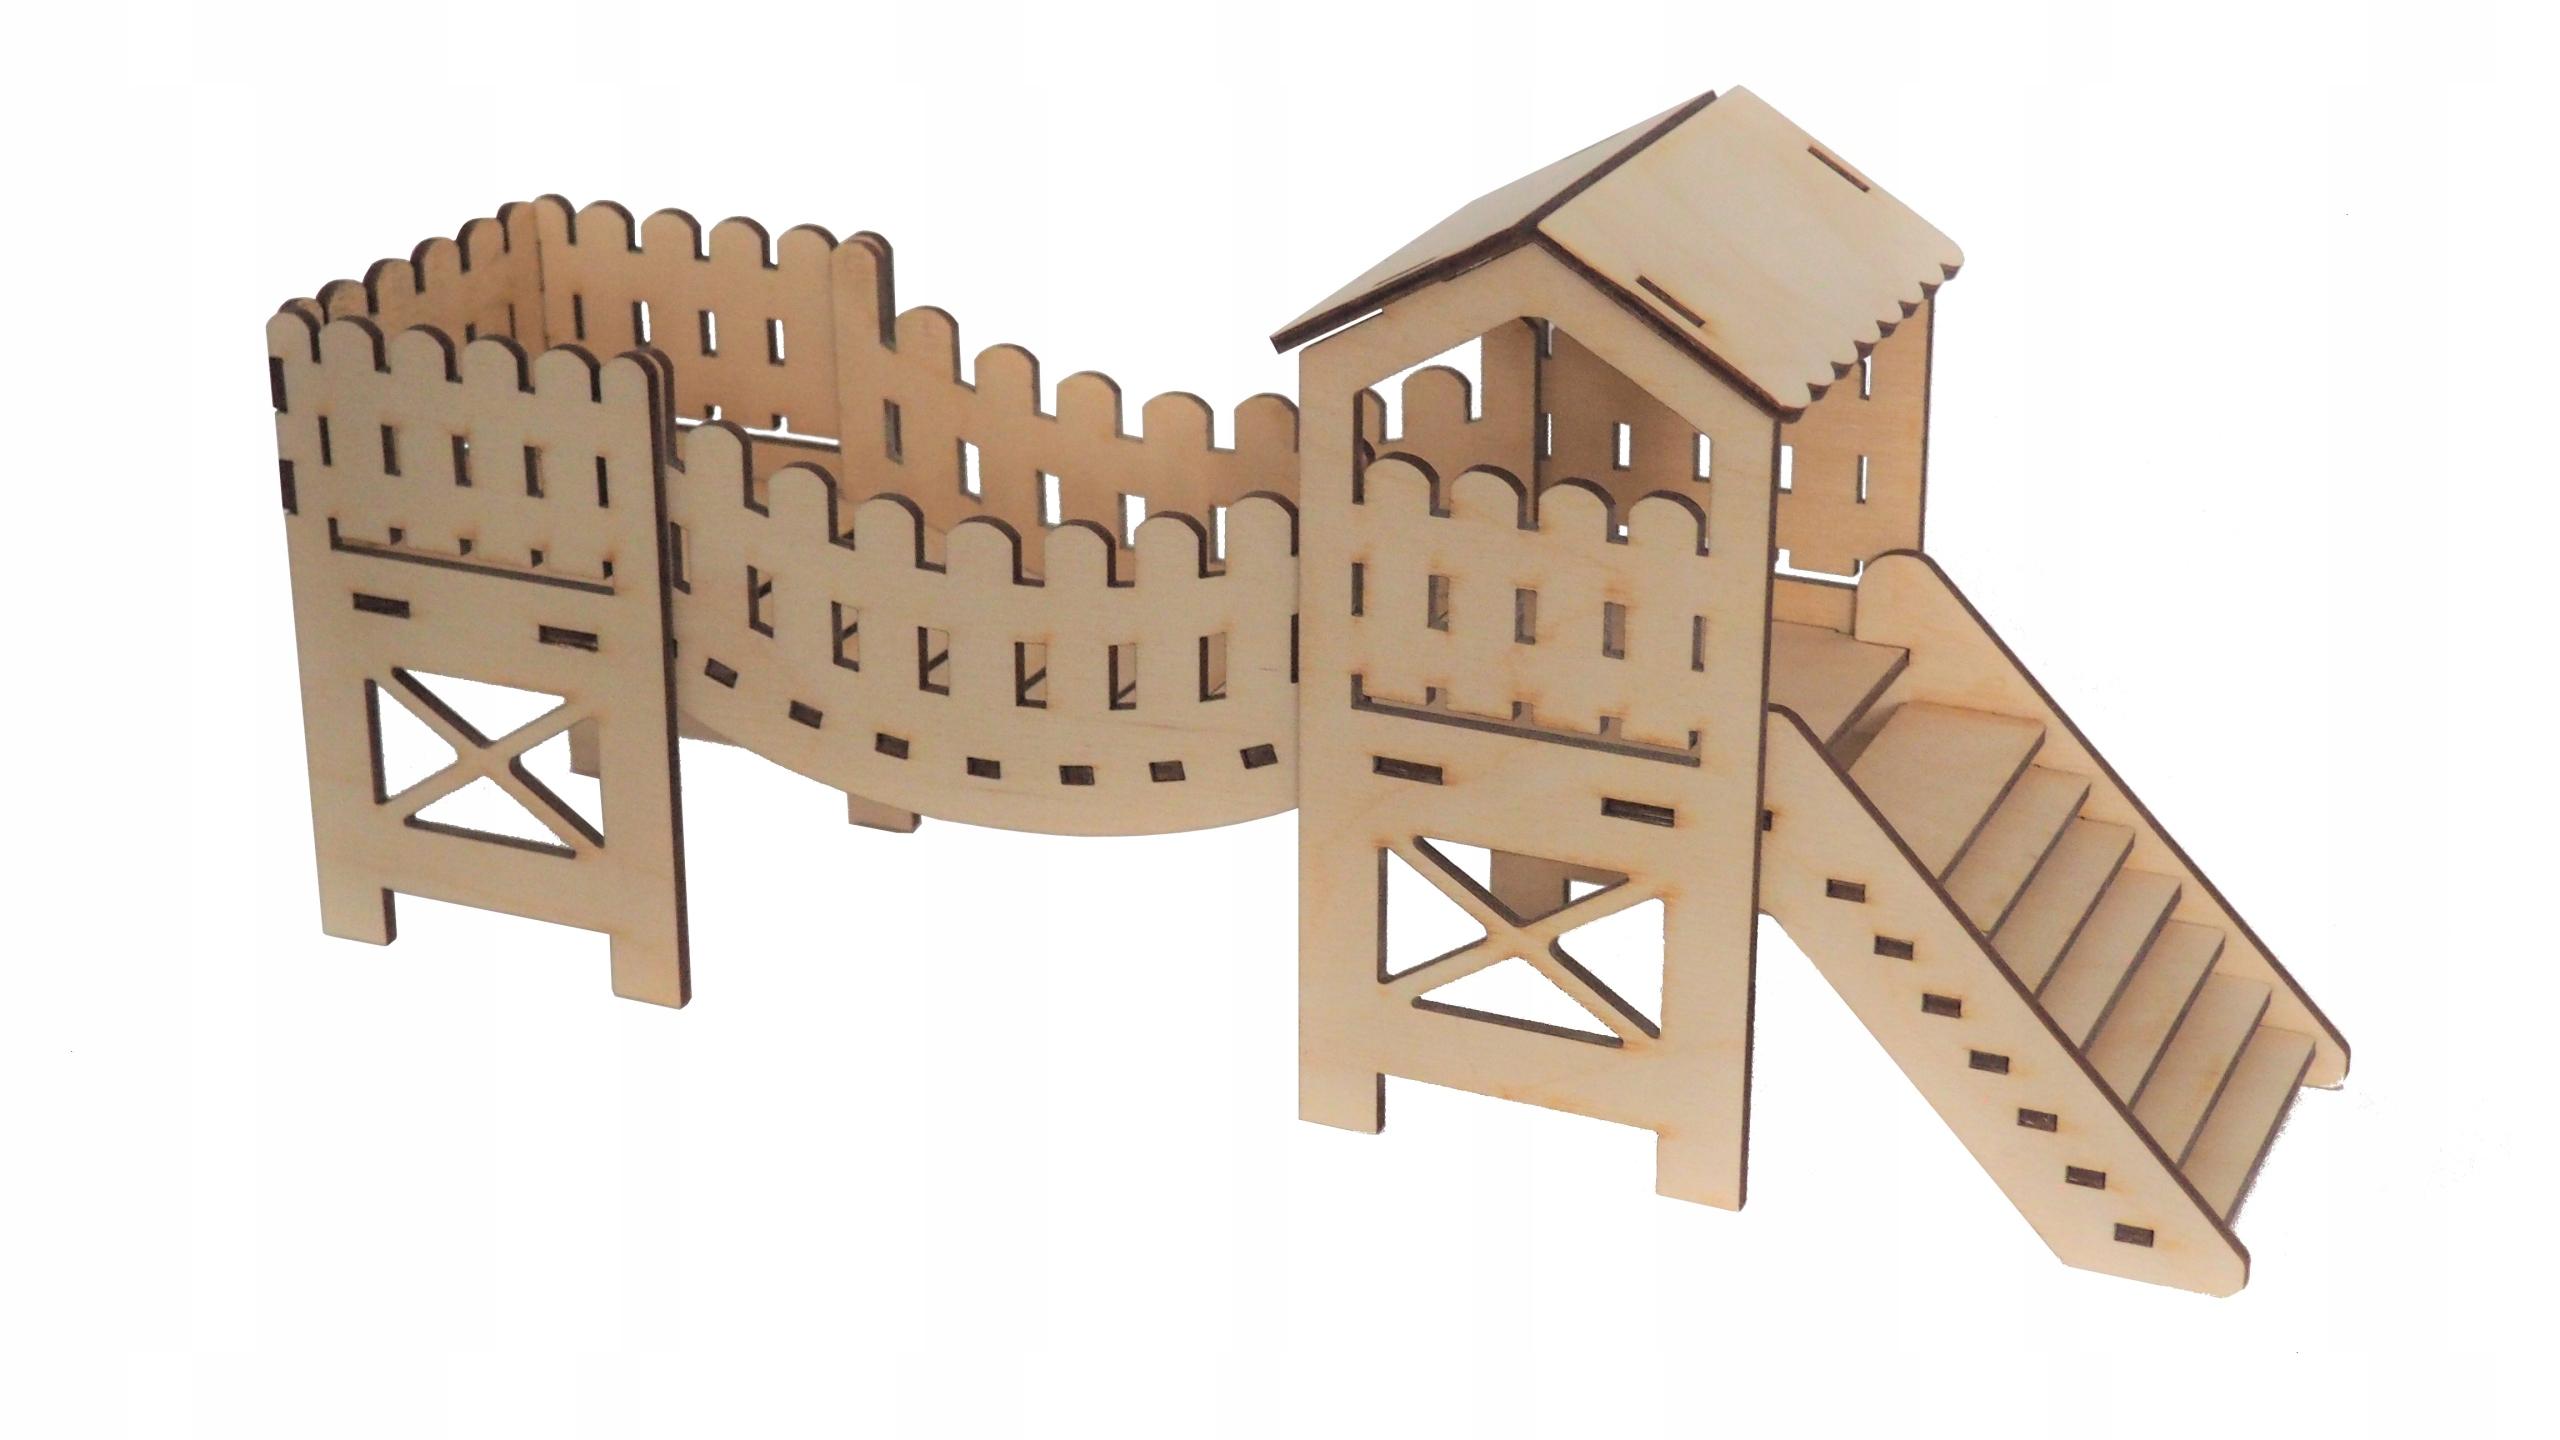 Деревянный домик для мышки-хомяка